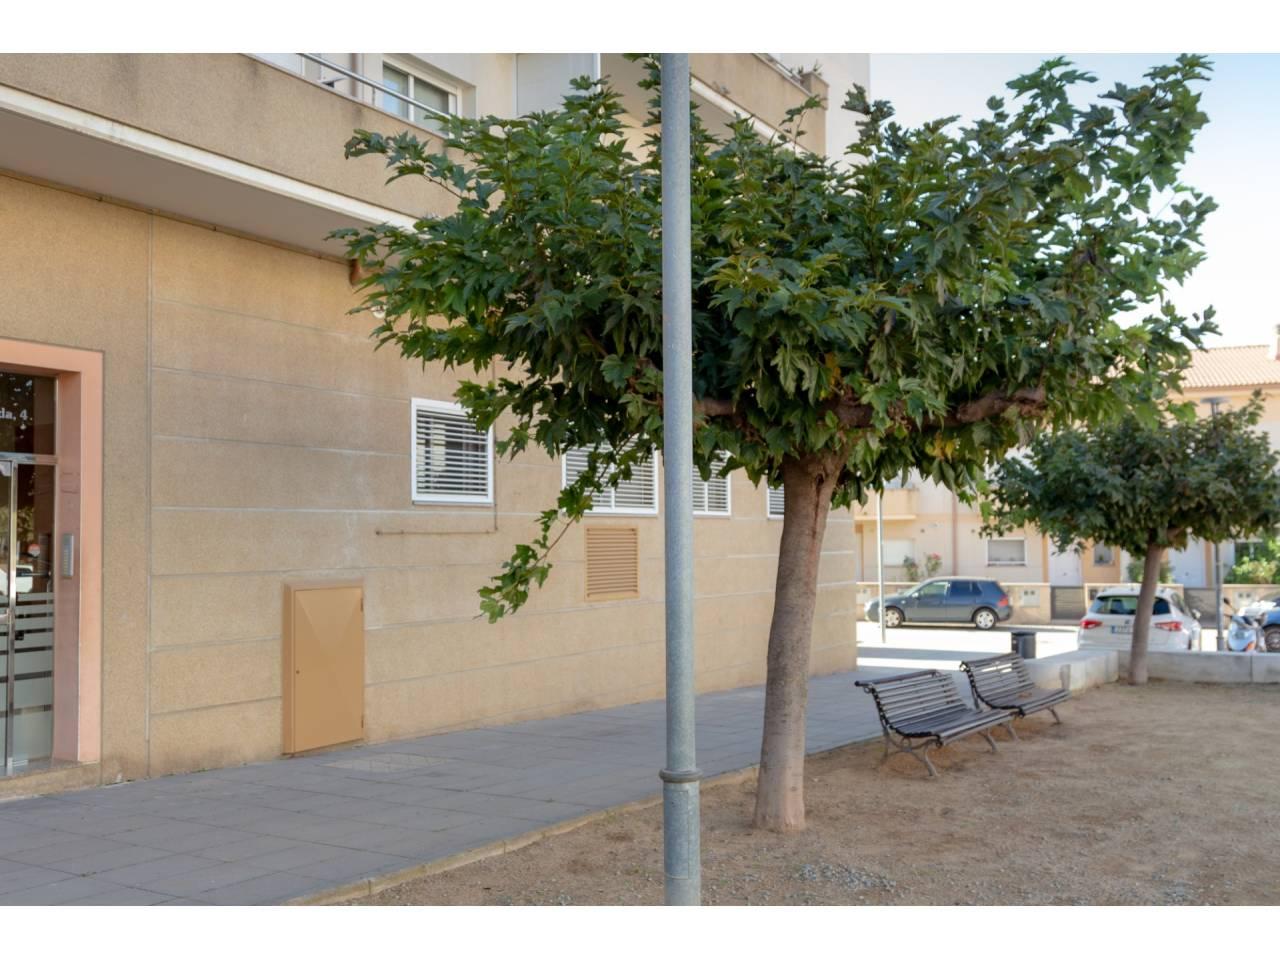 Piso  Plaza merce rodorera, 4. Altura piso 2º, piso superficie total 102 m², superficie útil 91